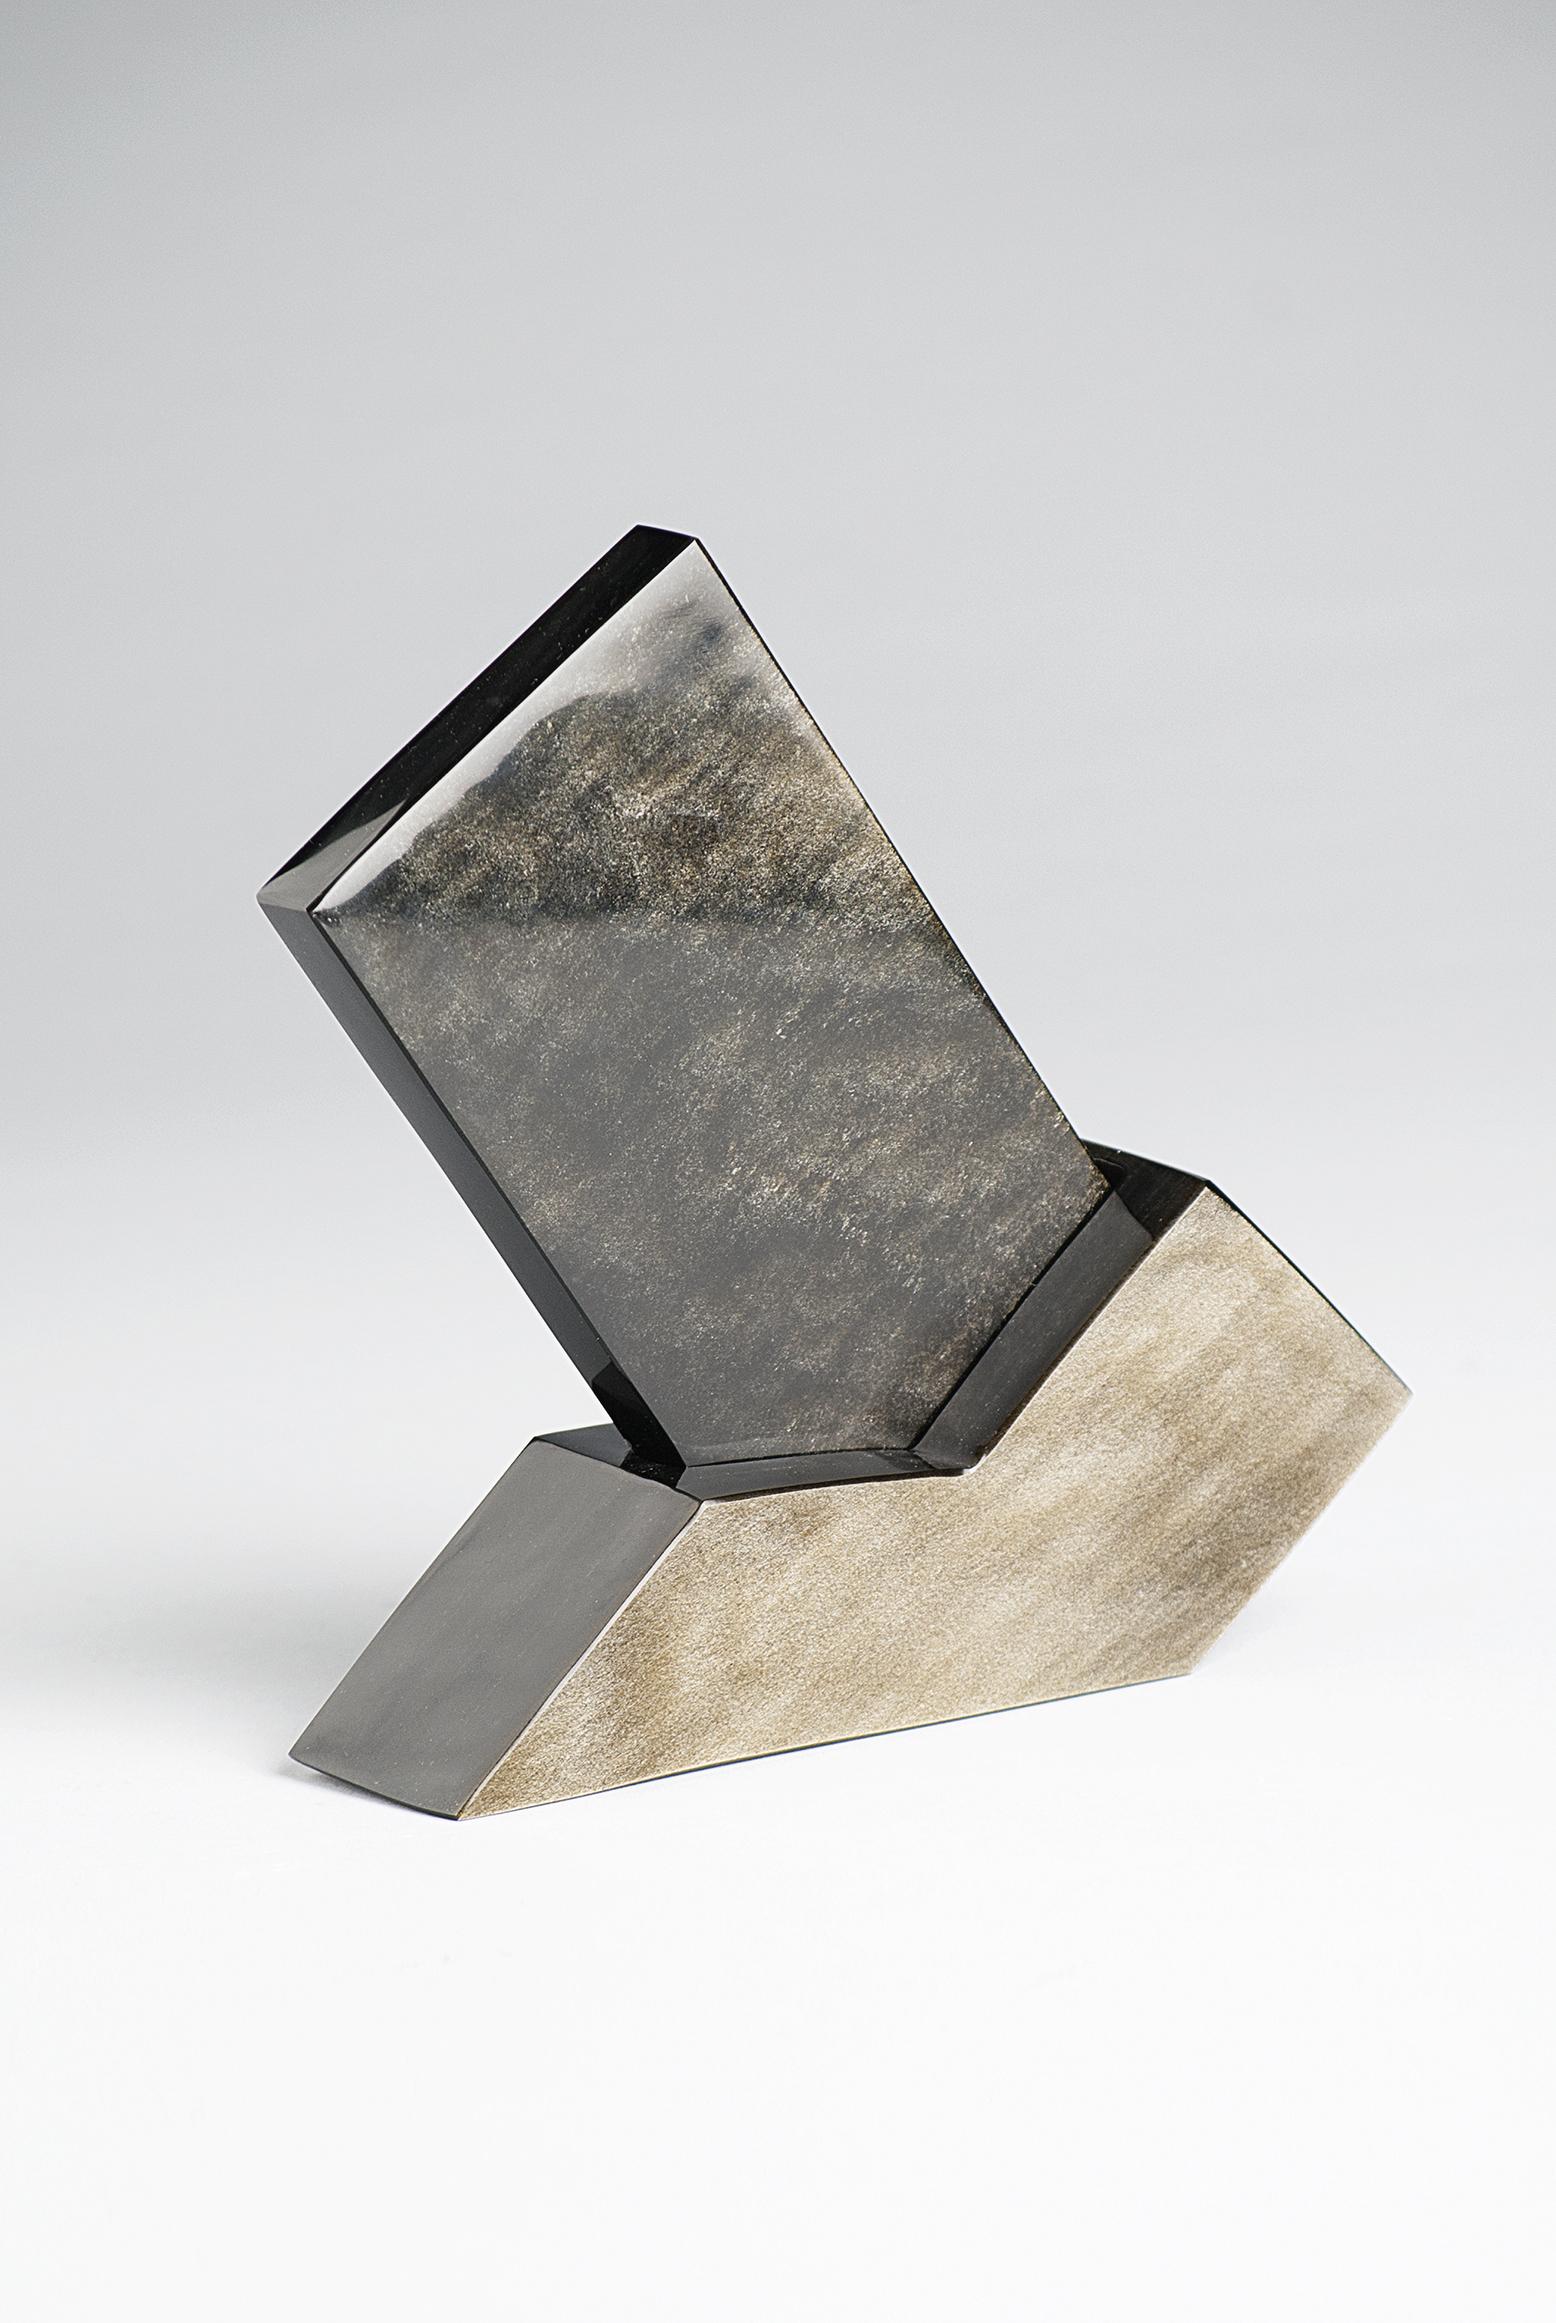 Web2-Obsidian_DSC0062a-Anahuac-Mexico-Design-Time-Marion-Friedmann.jpg